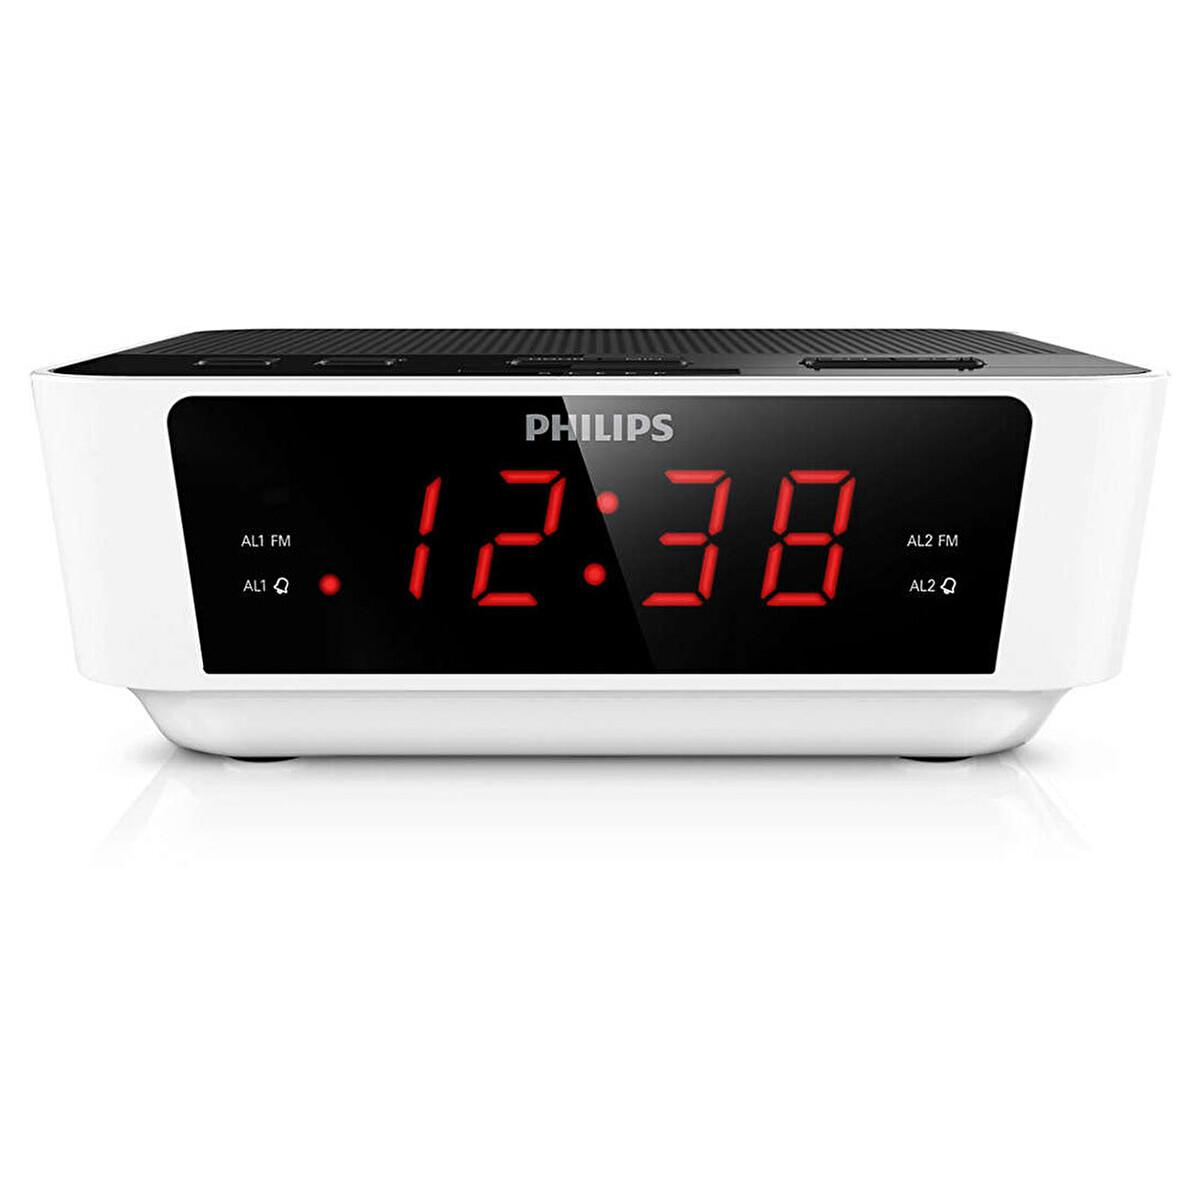 Philips Aj311512 Alarm Saatli Radyo 30031170 Carrefoursa